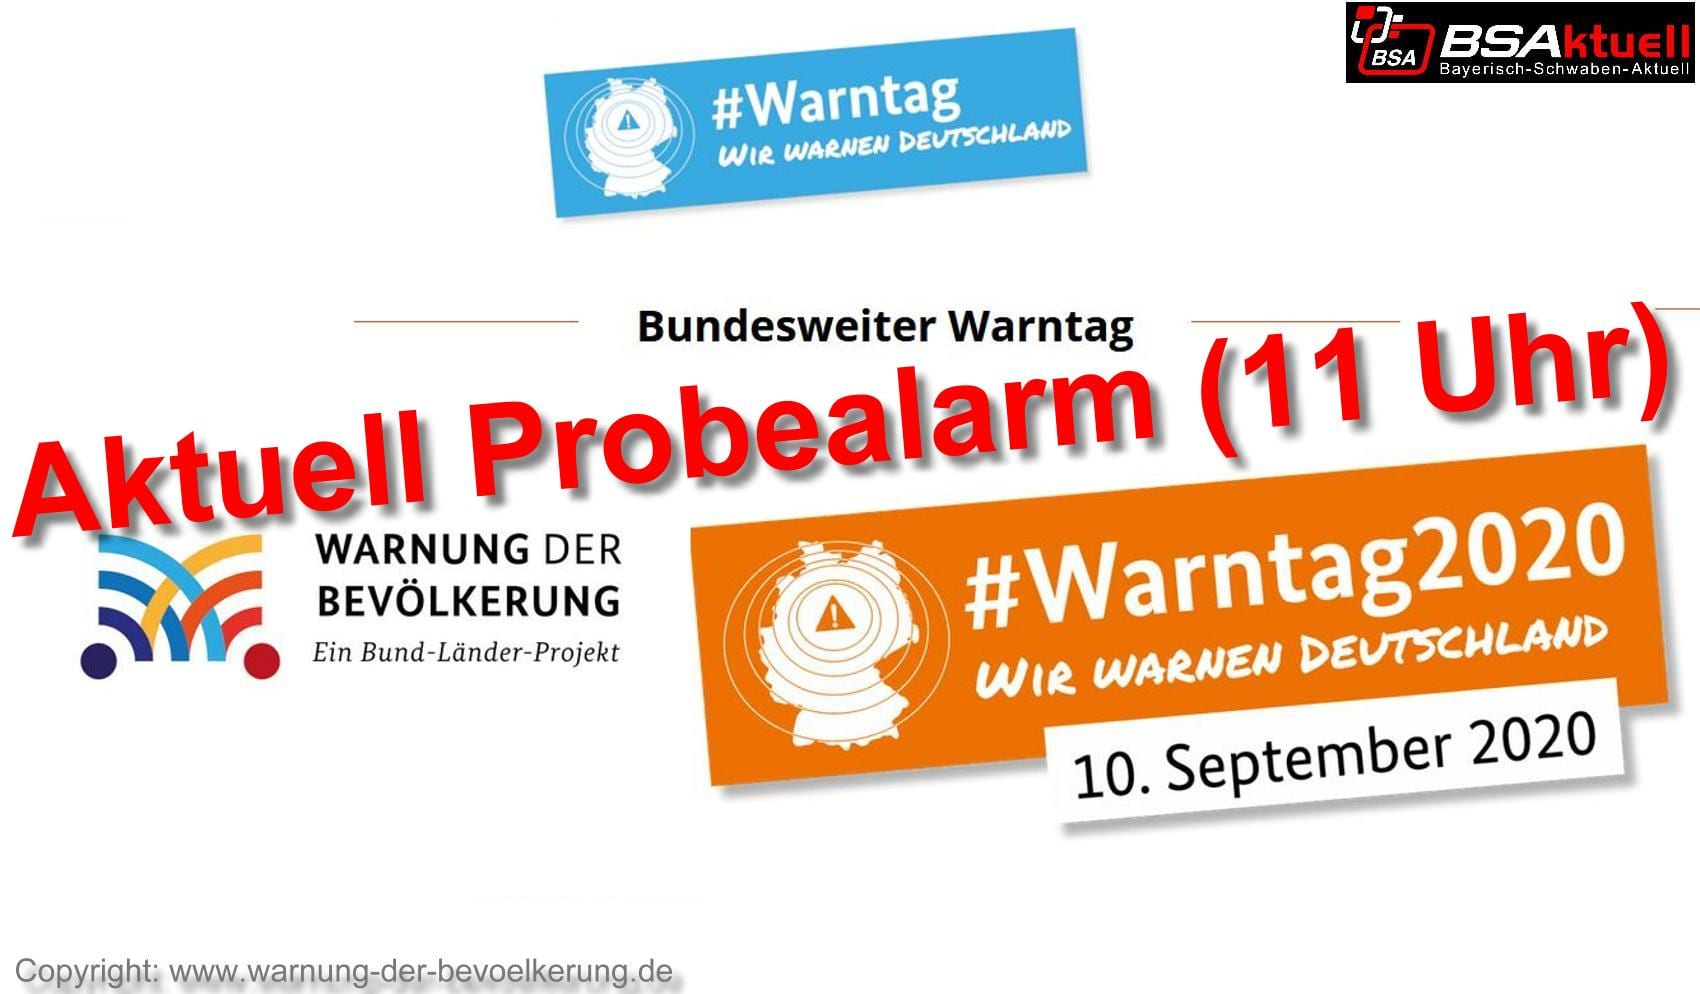 Warntag-Symbolbild Probealarm